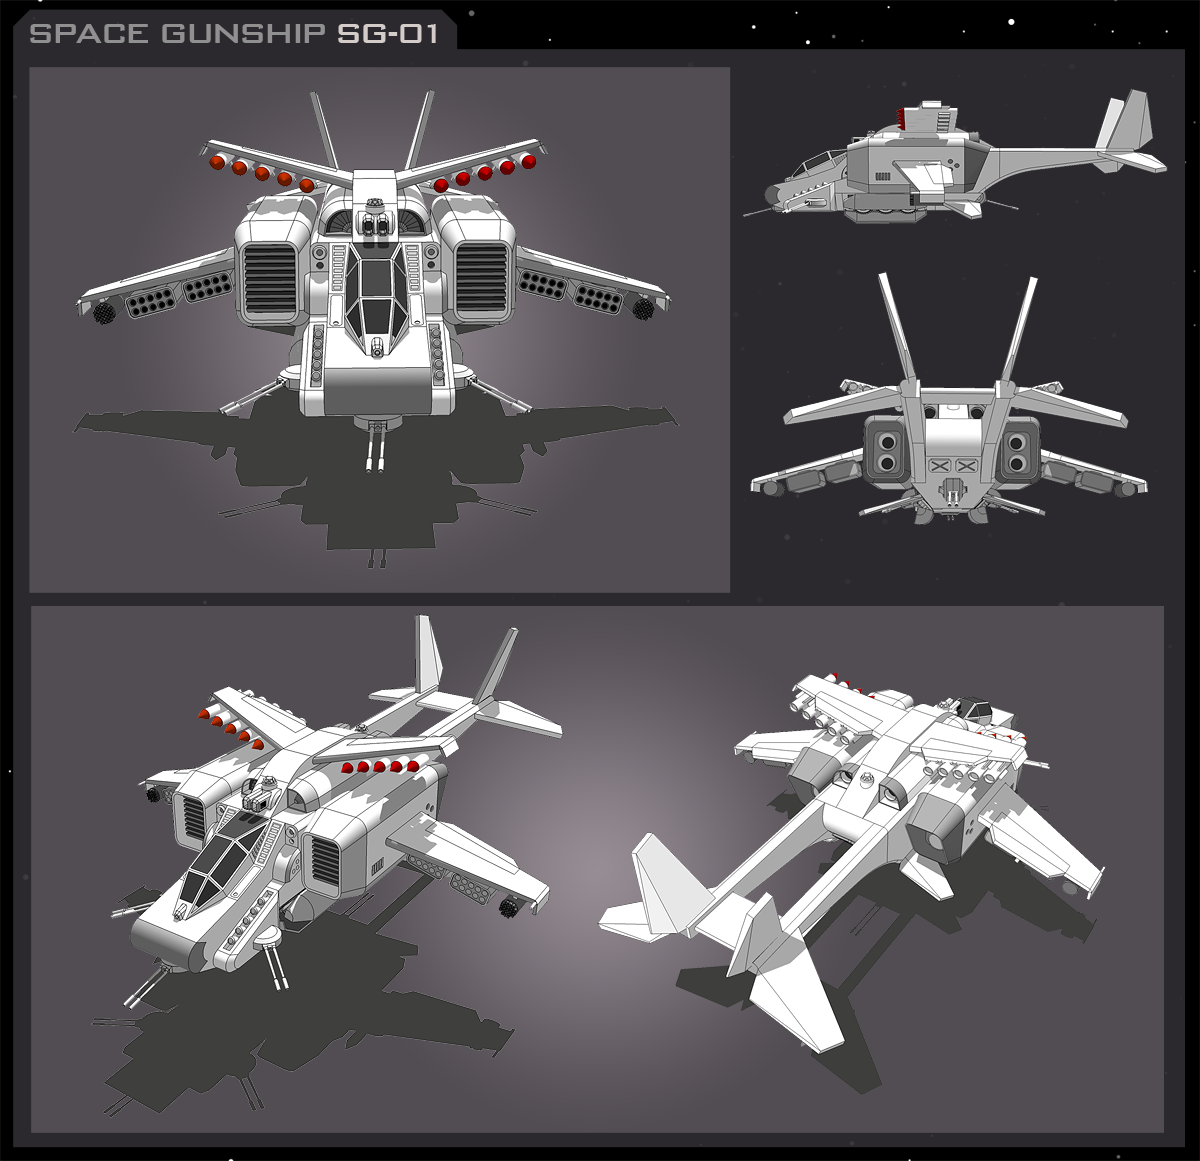 Space Gunship SG-01 by vpRaptor